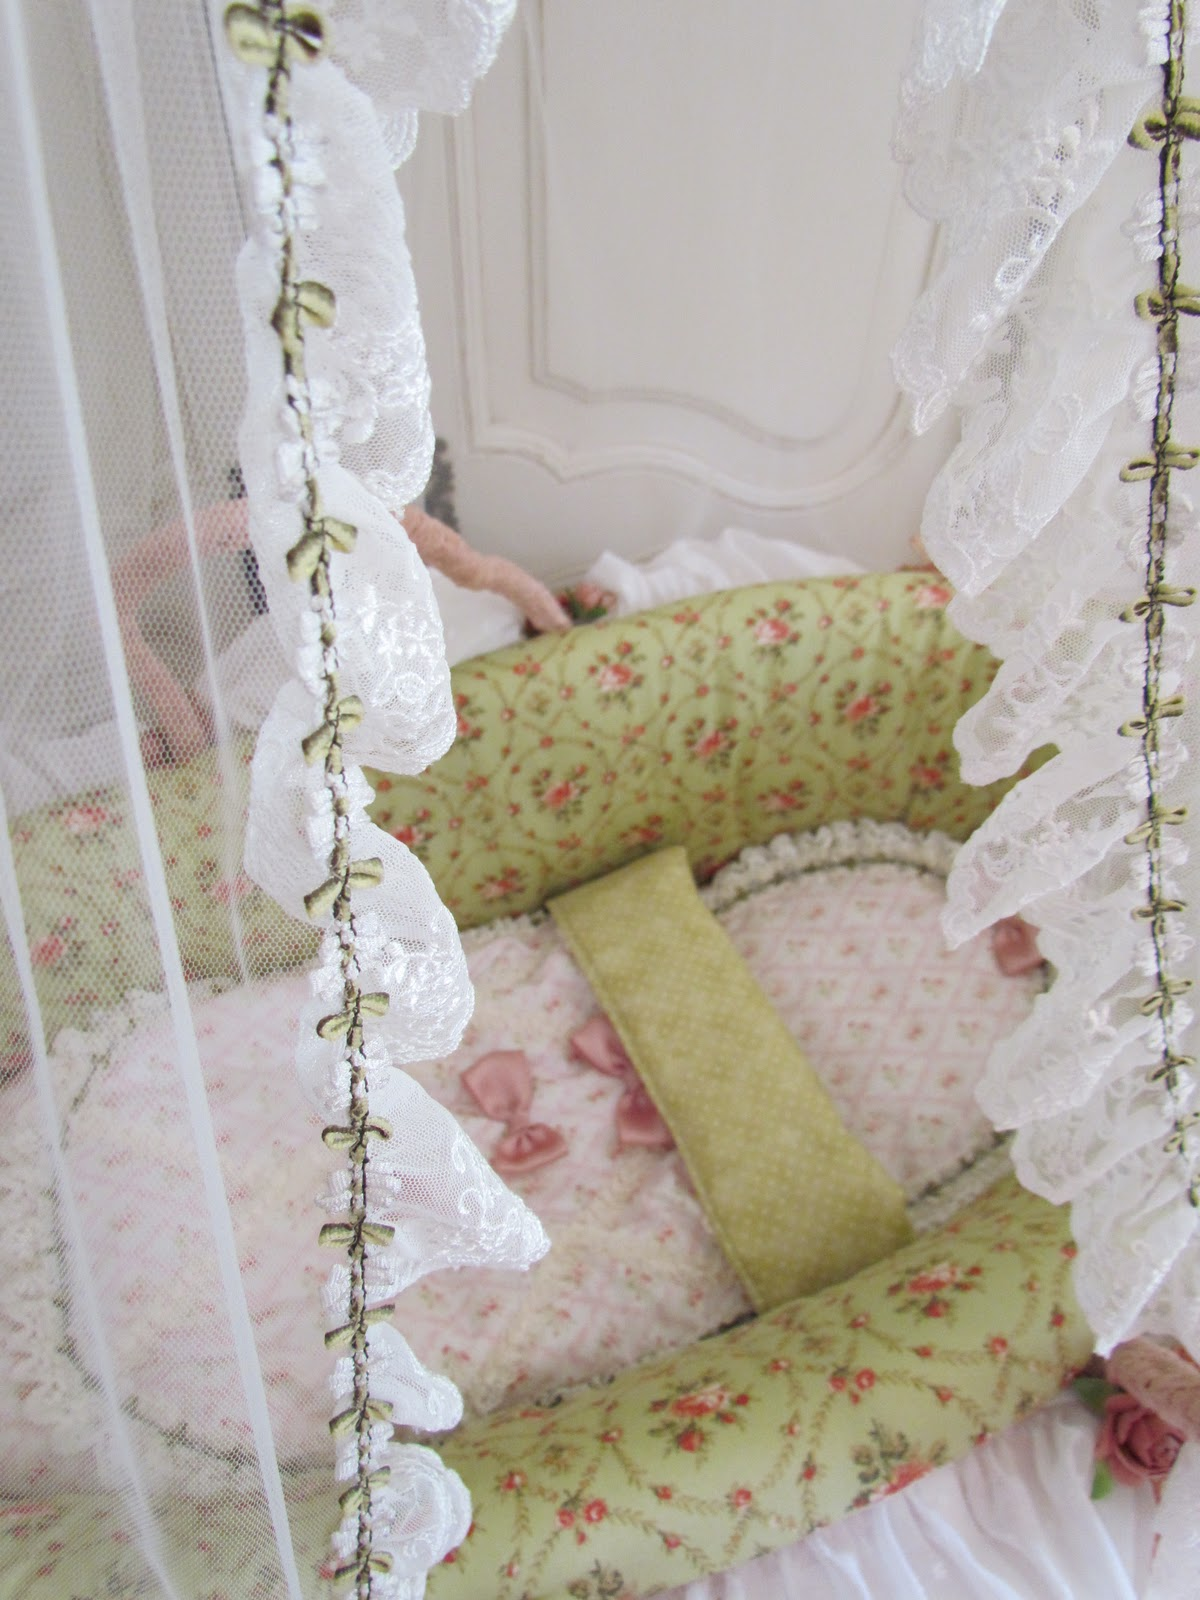 Baby Under Blanket Top Cake